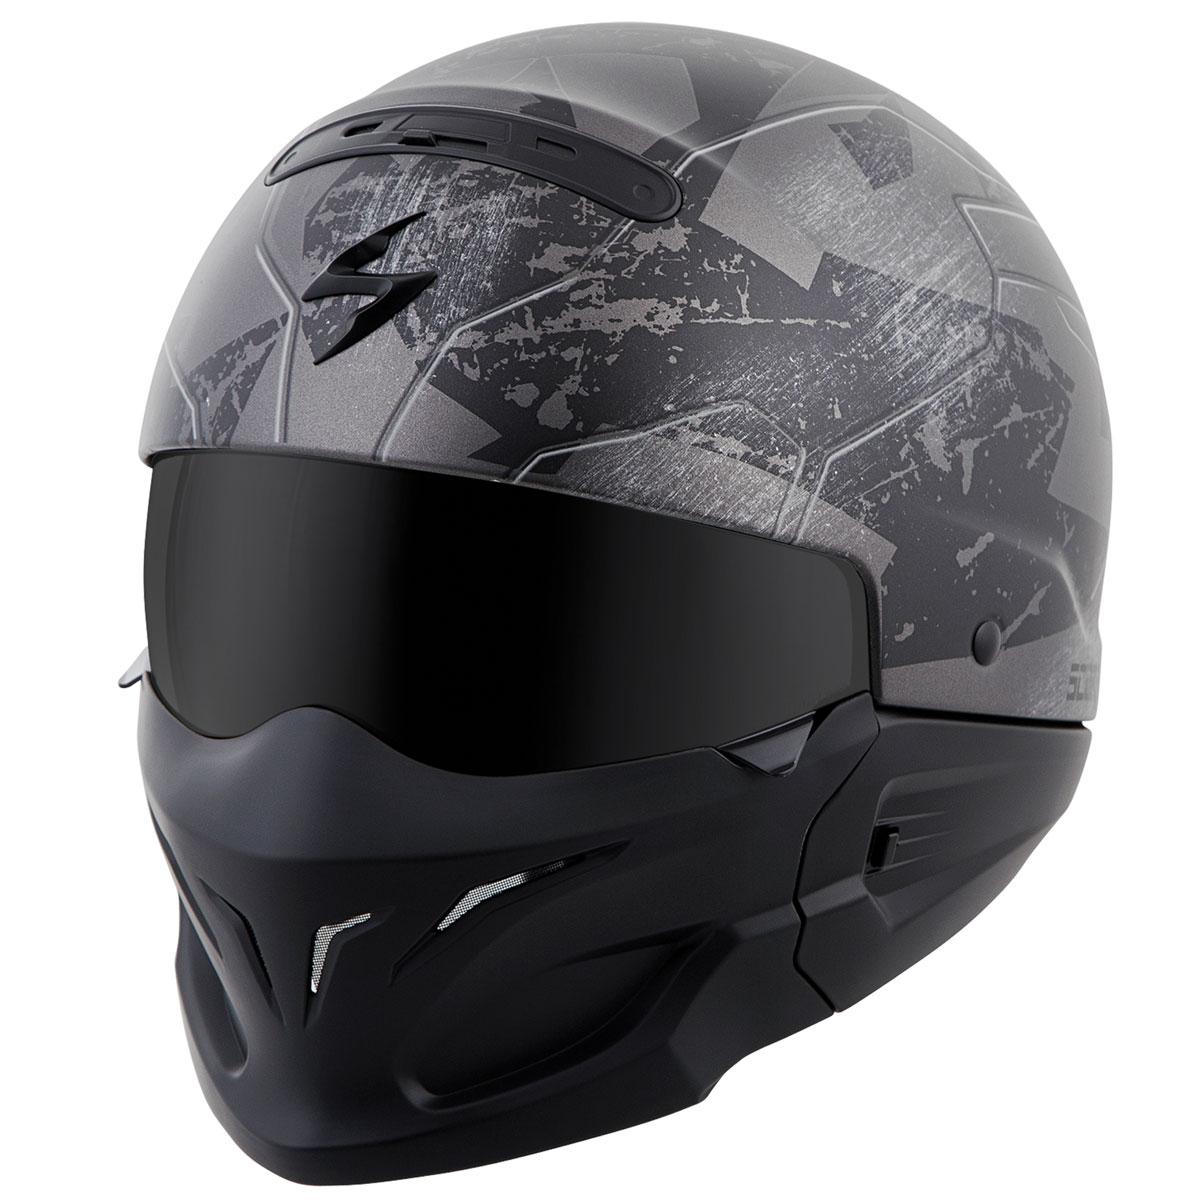 Scorpion EXO Covert Ratnik Phantom Half Helmet